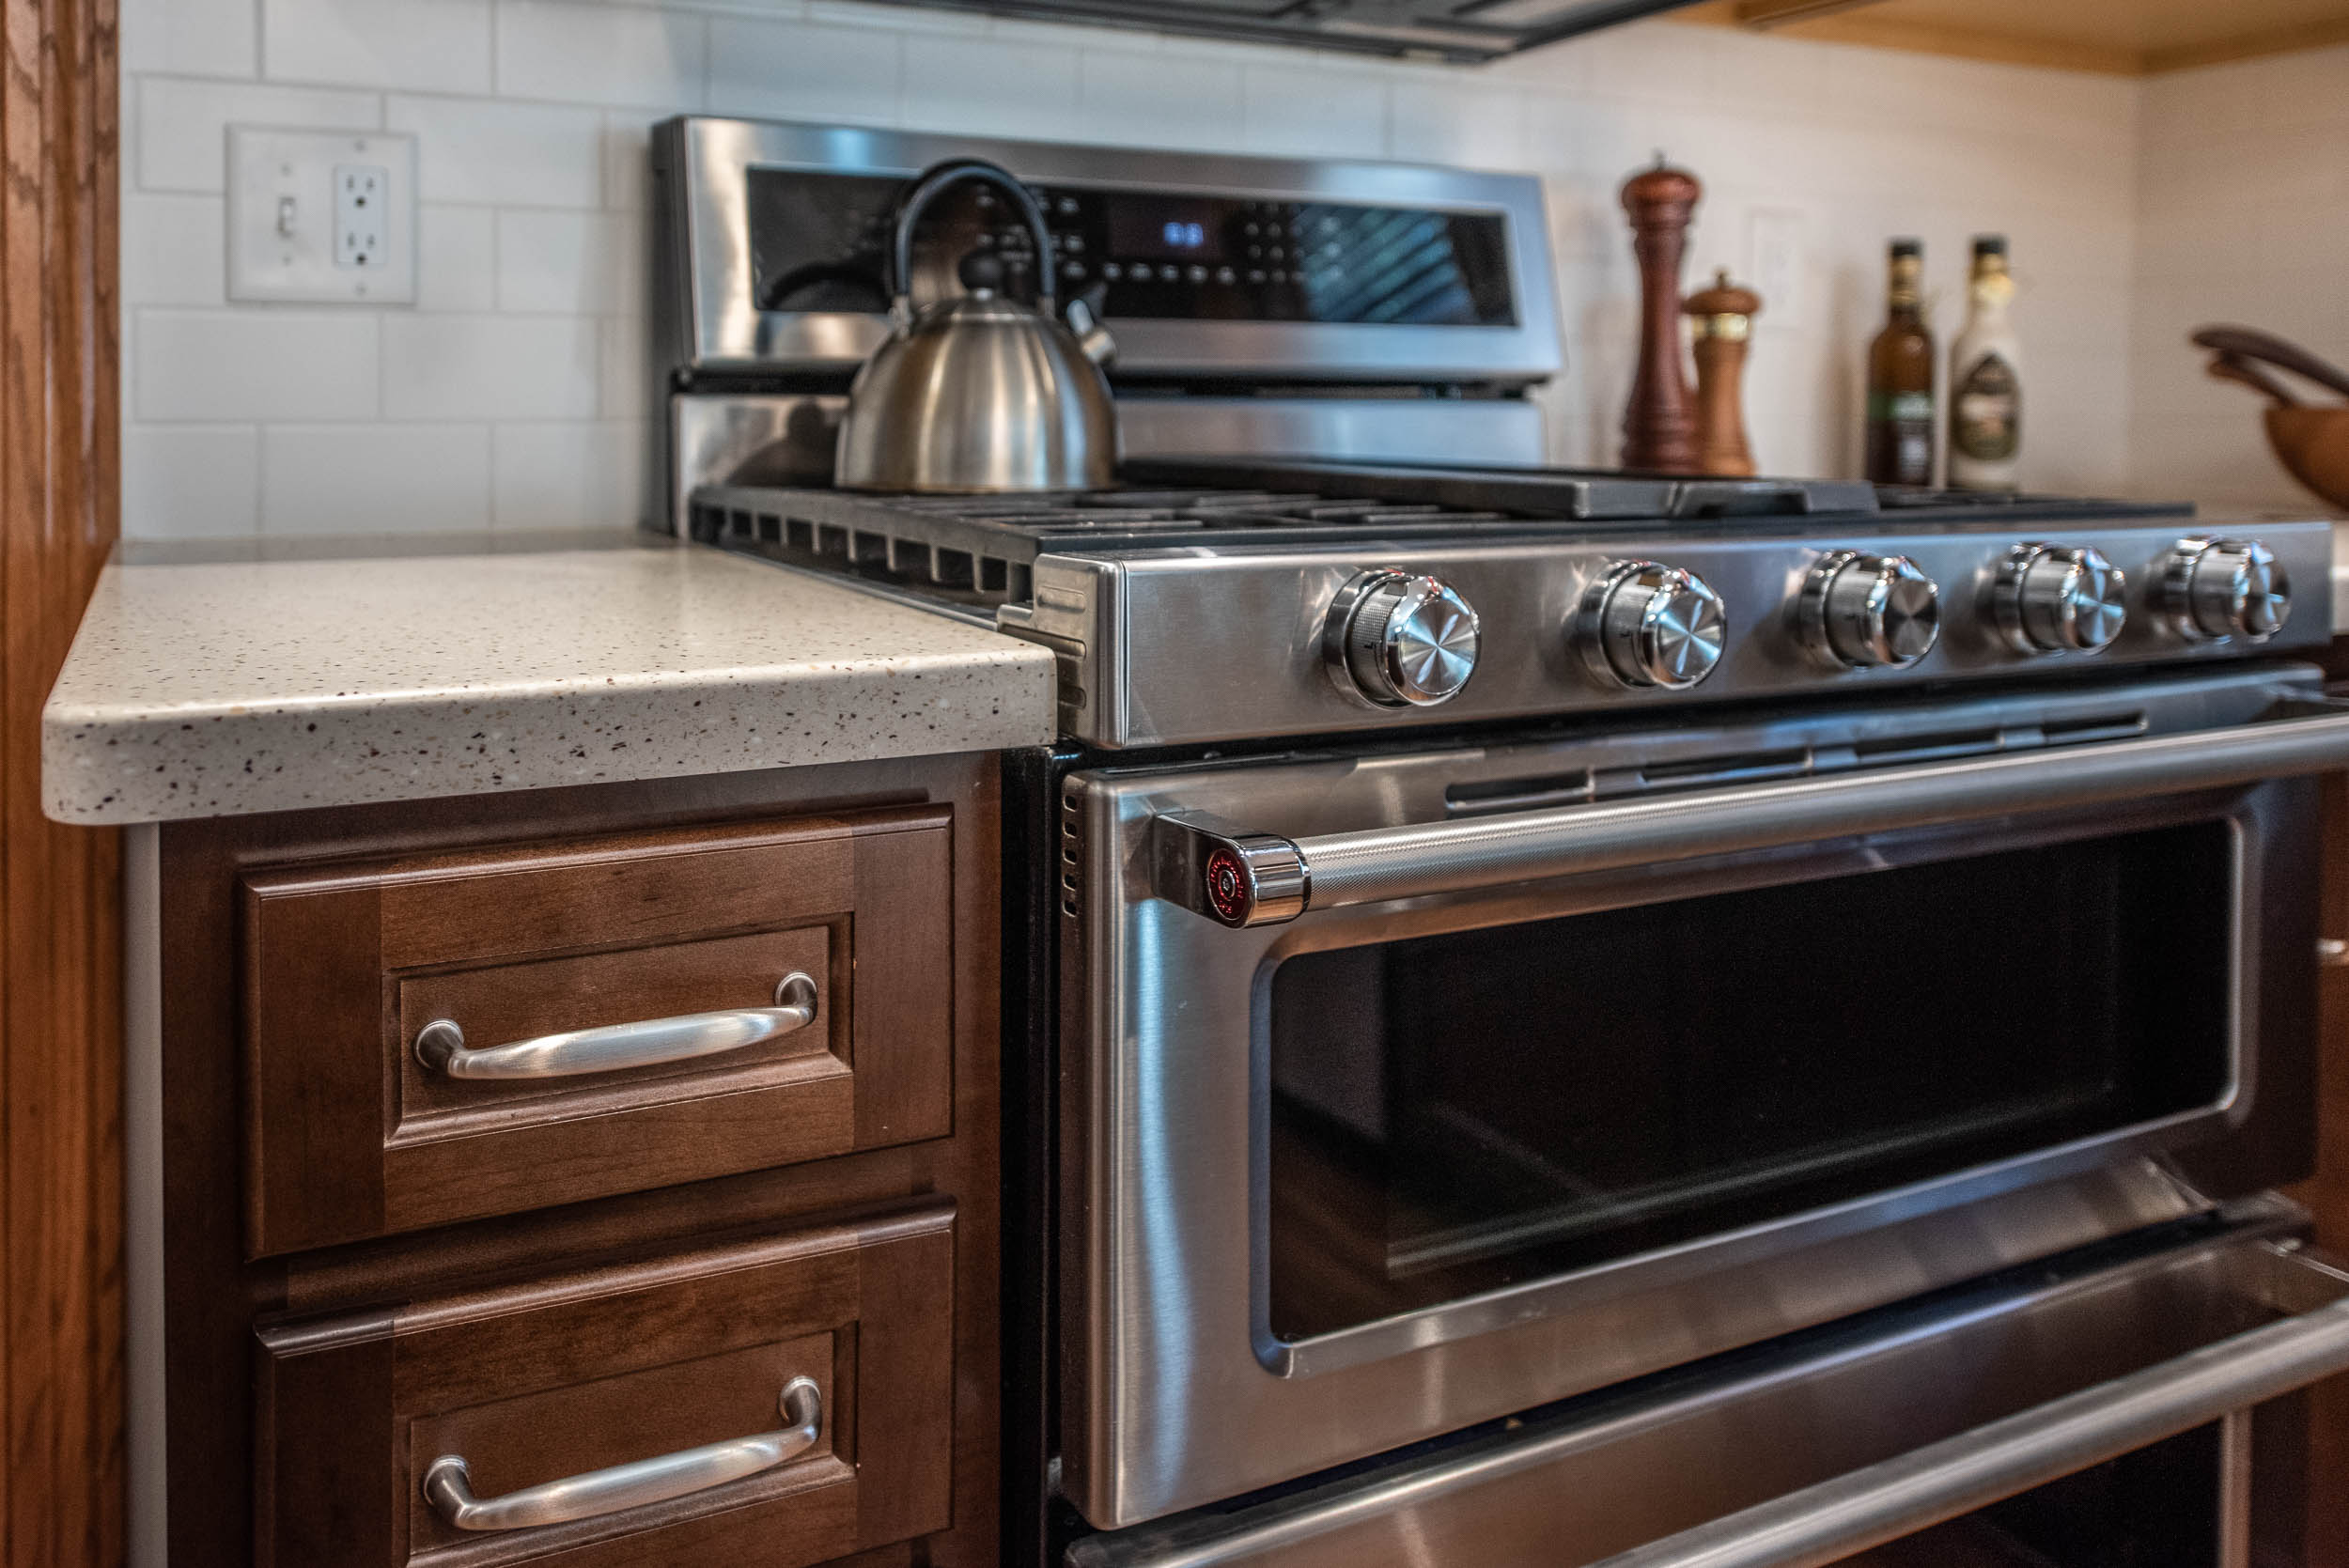 KitchenAid Double Oven Dual Fuel Range